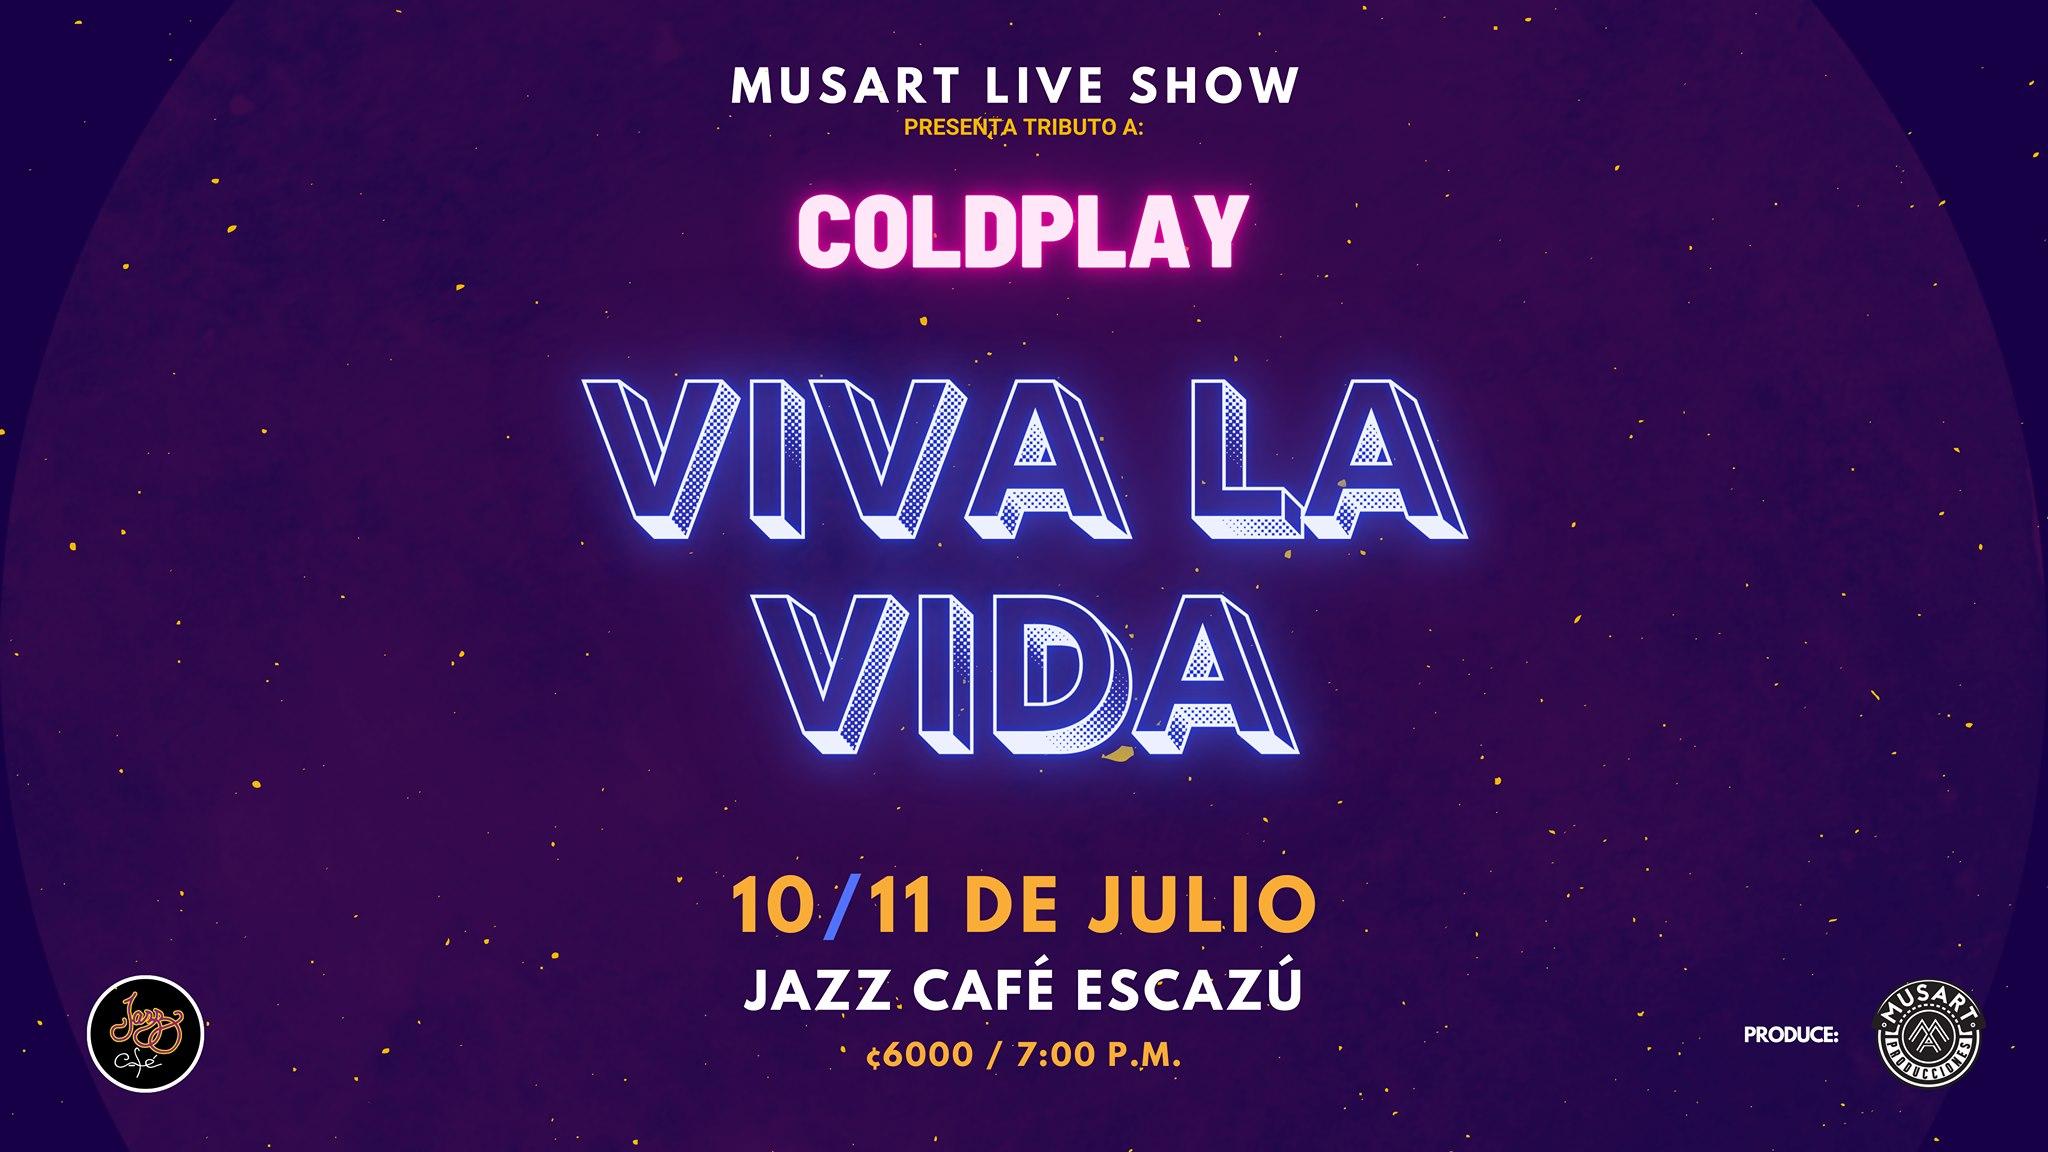 Tributo a Coldplay - Viva La Vida